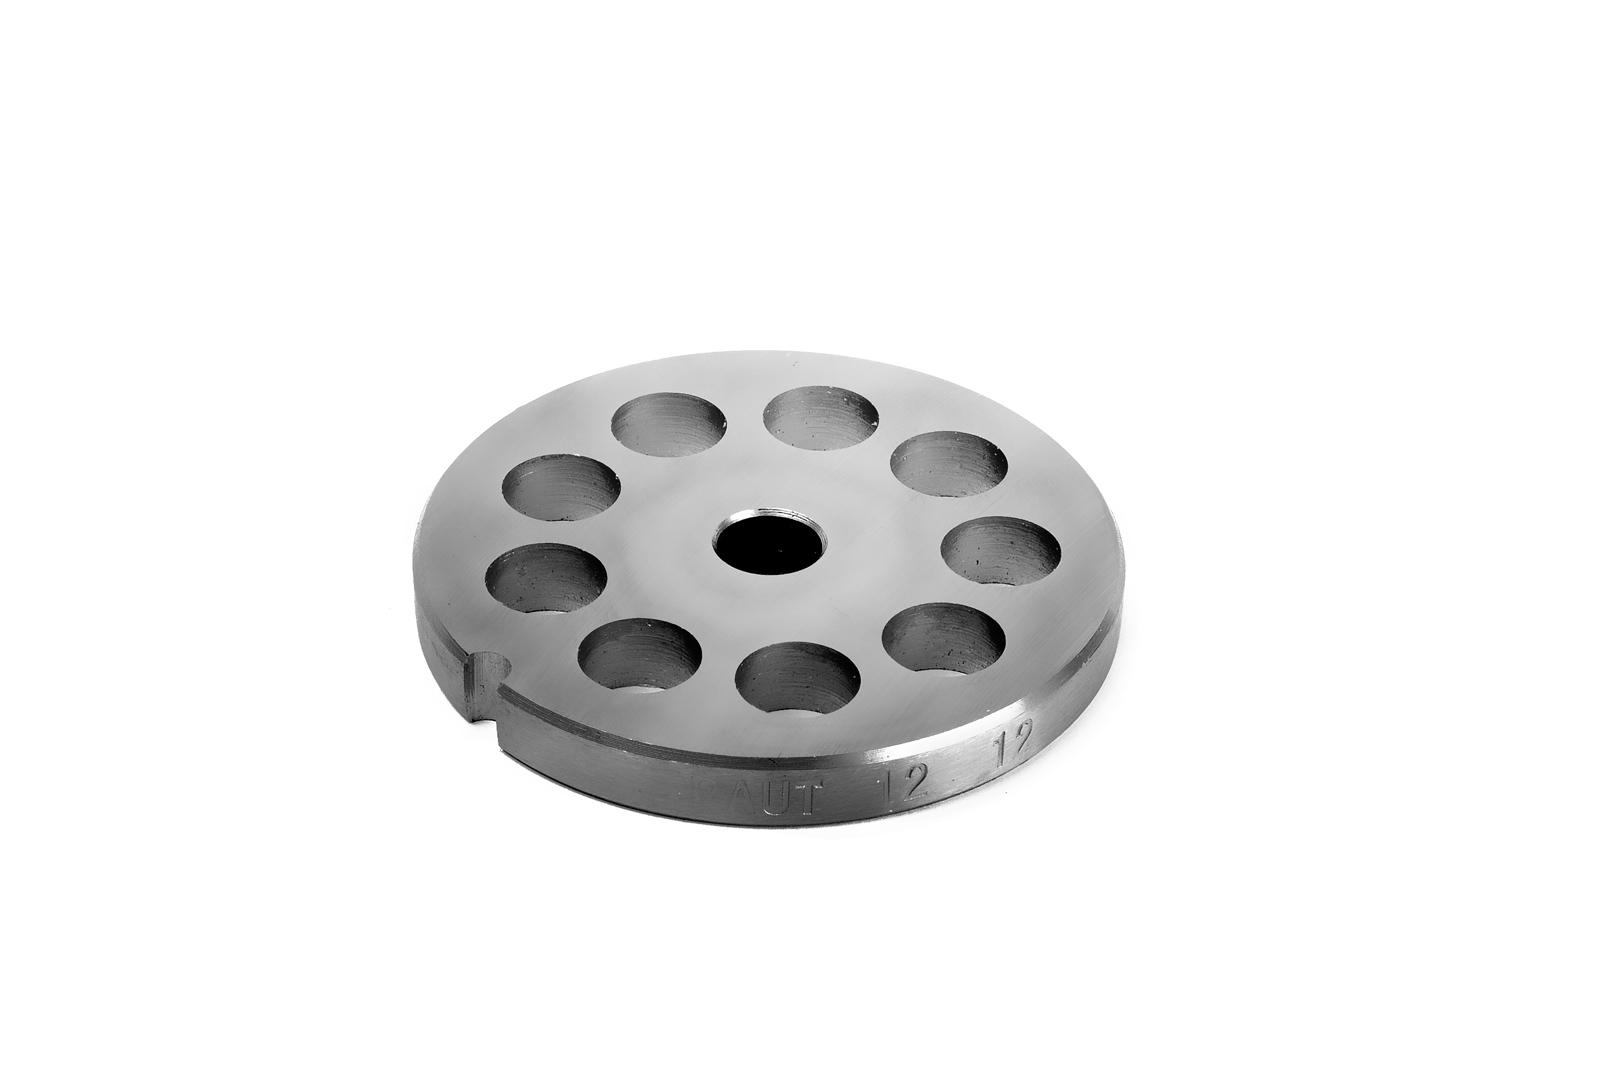 Piastra per Tritacarne 12 - Fori da 12 mm - Tre Spade